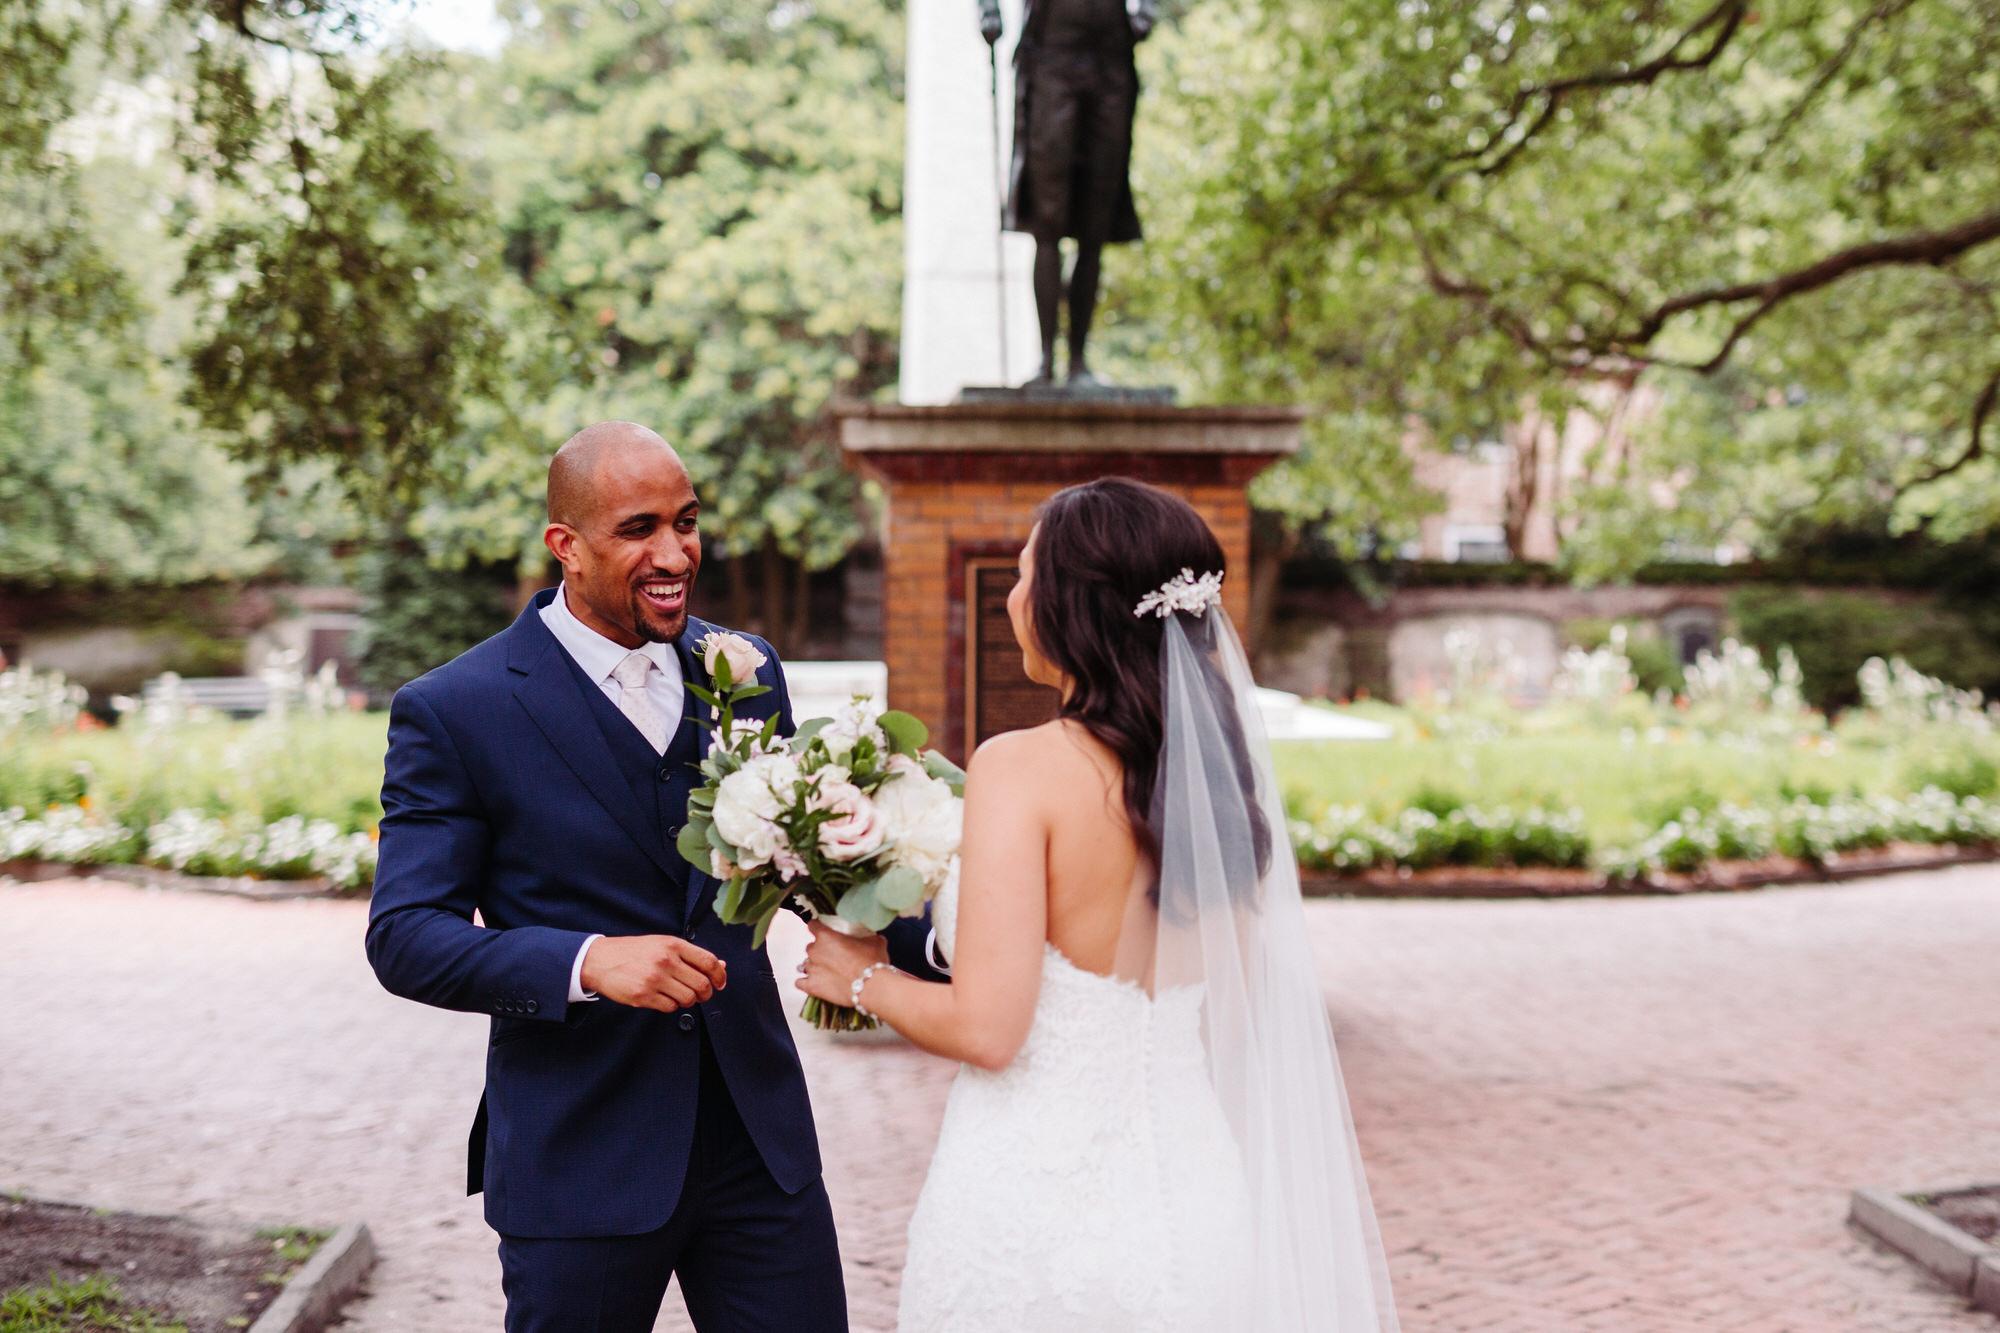 st-lukes-chapel-cannon-green-charleston-wedding-894.JPG